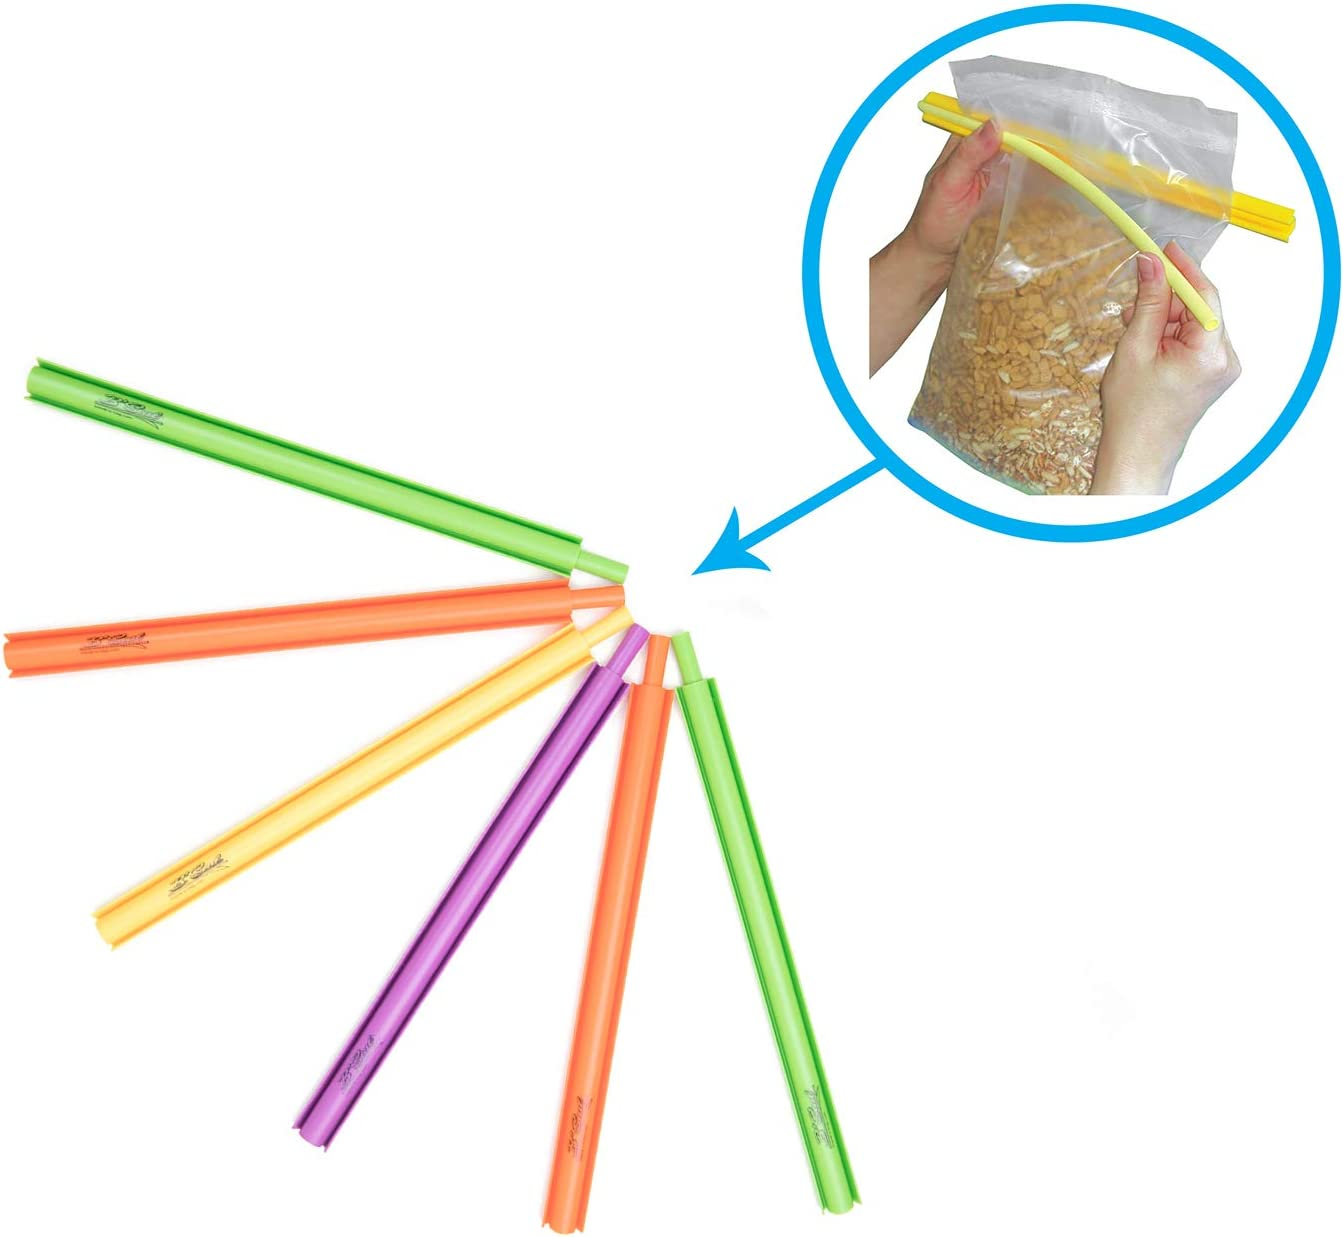 B'Seal Bag Sealer Chip Clip, Flexible, Dishwasher Safe, Freezer Friendly Airtight Food Seal Clamp (6 pack)